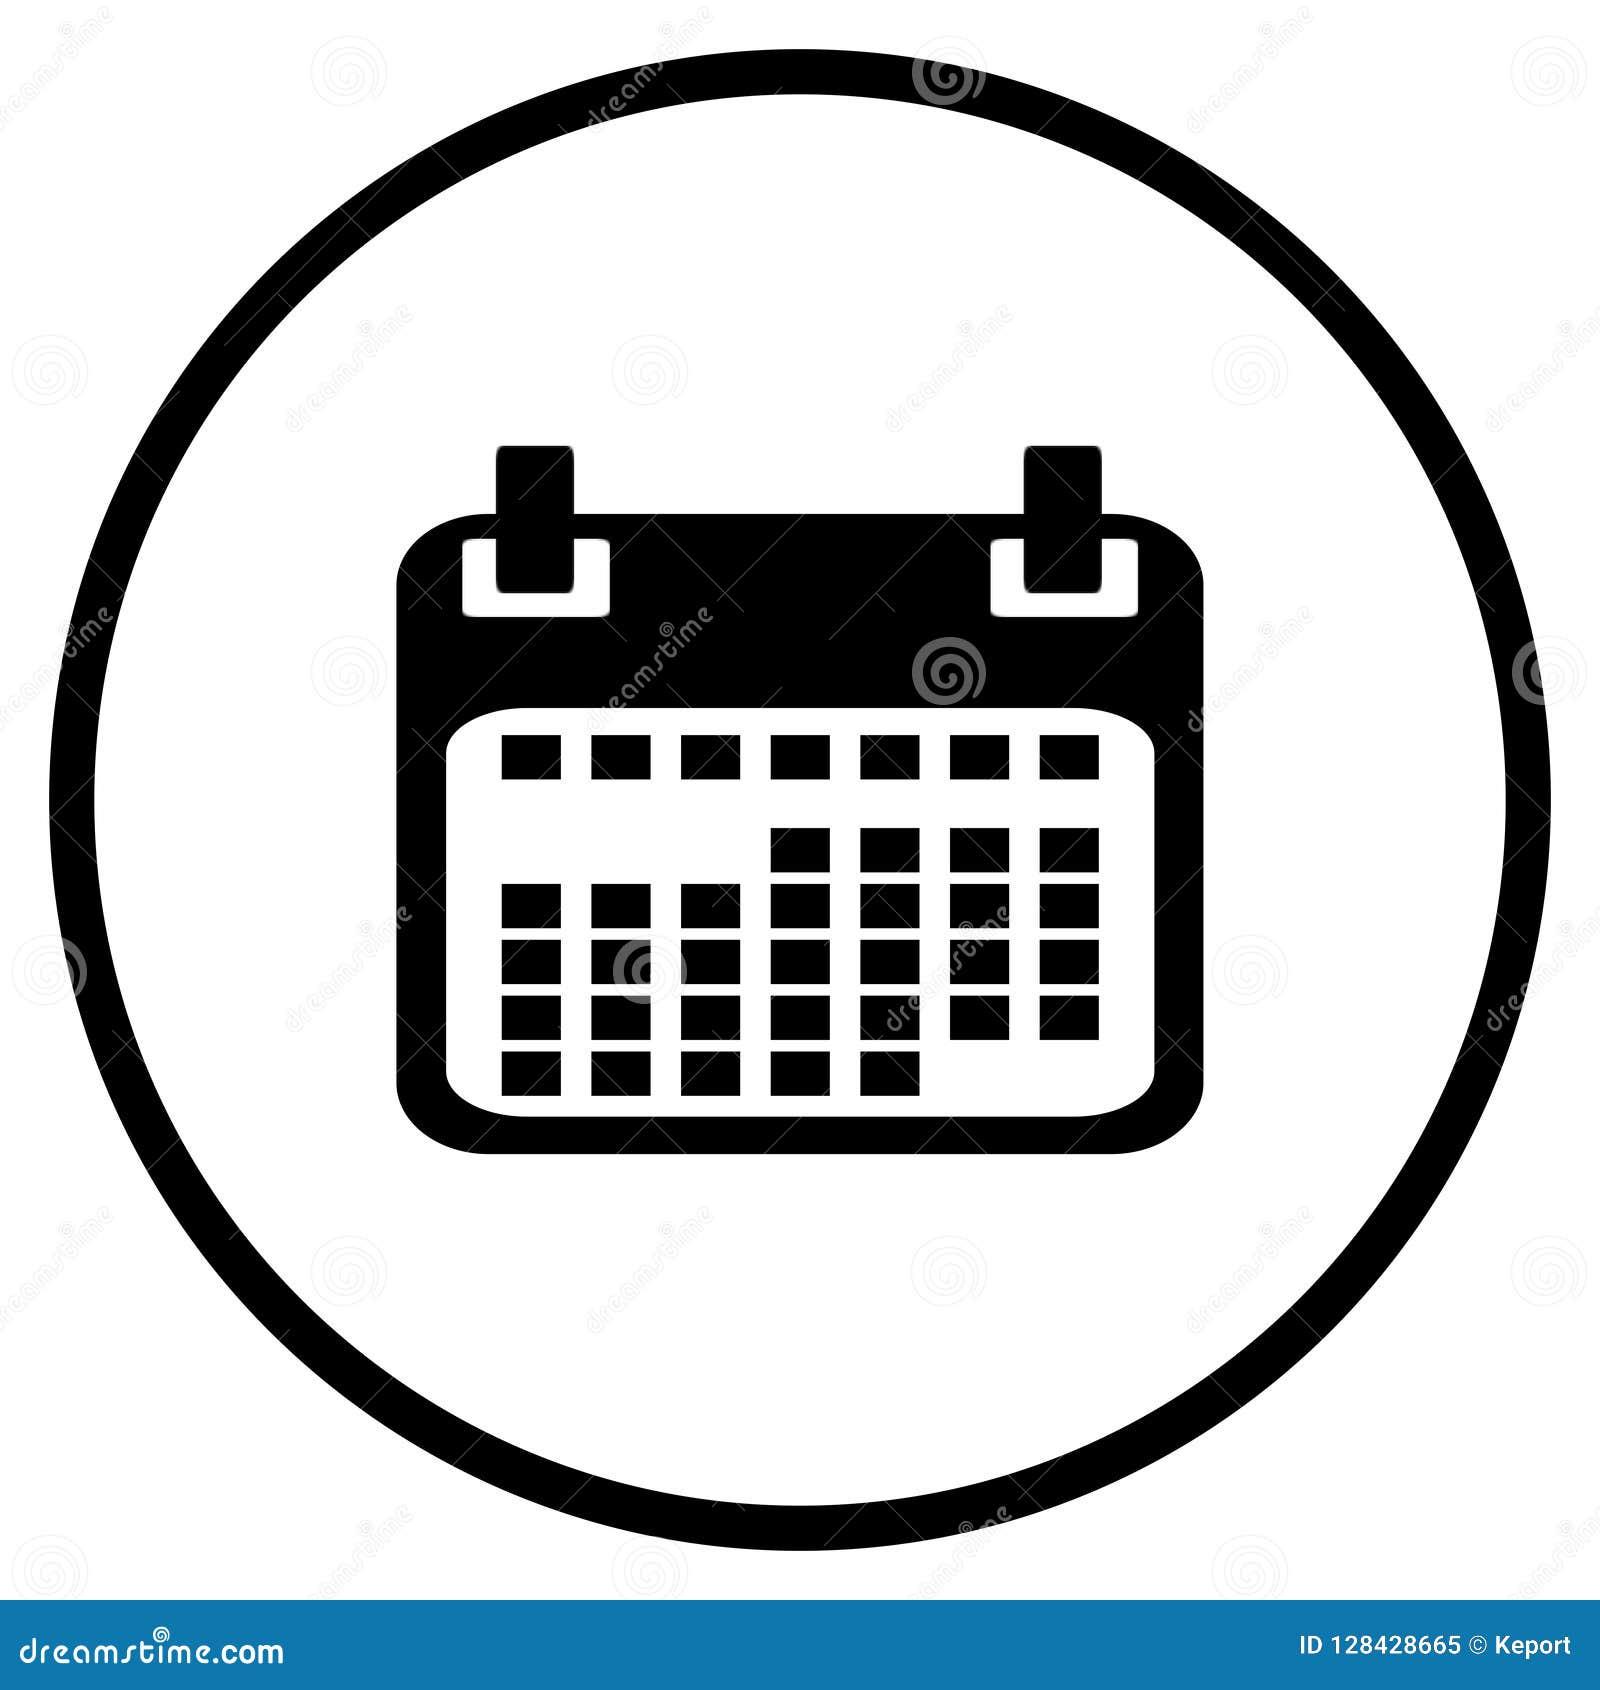 Kalendersymbol i cirkel